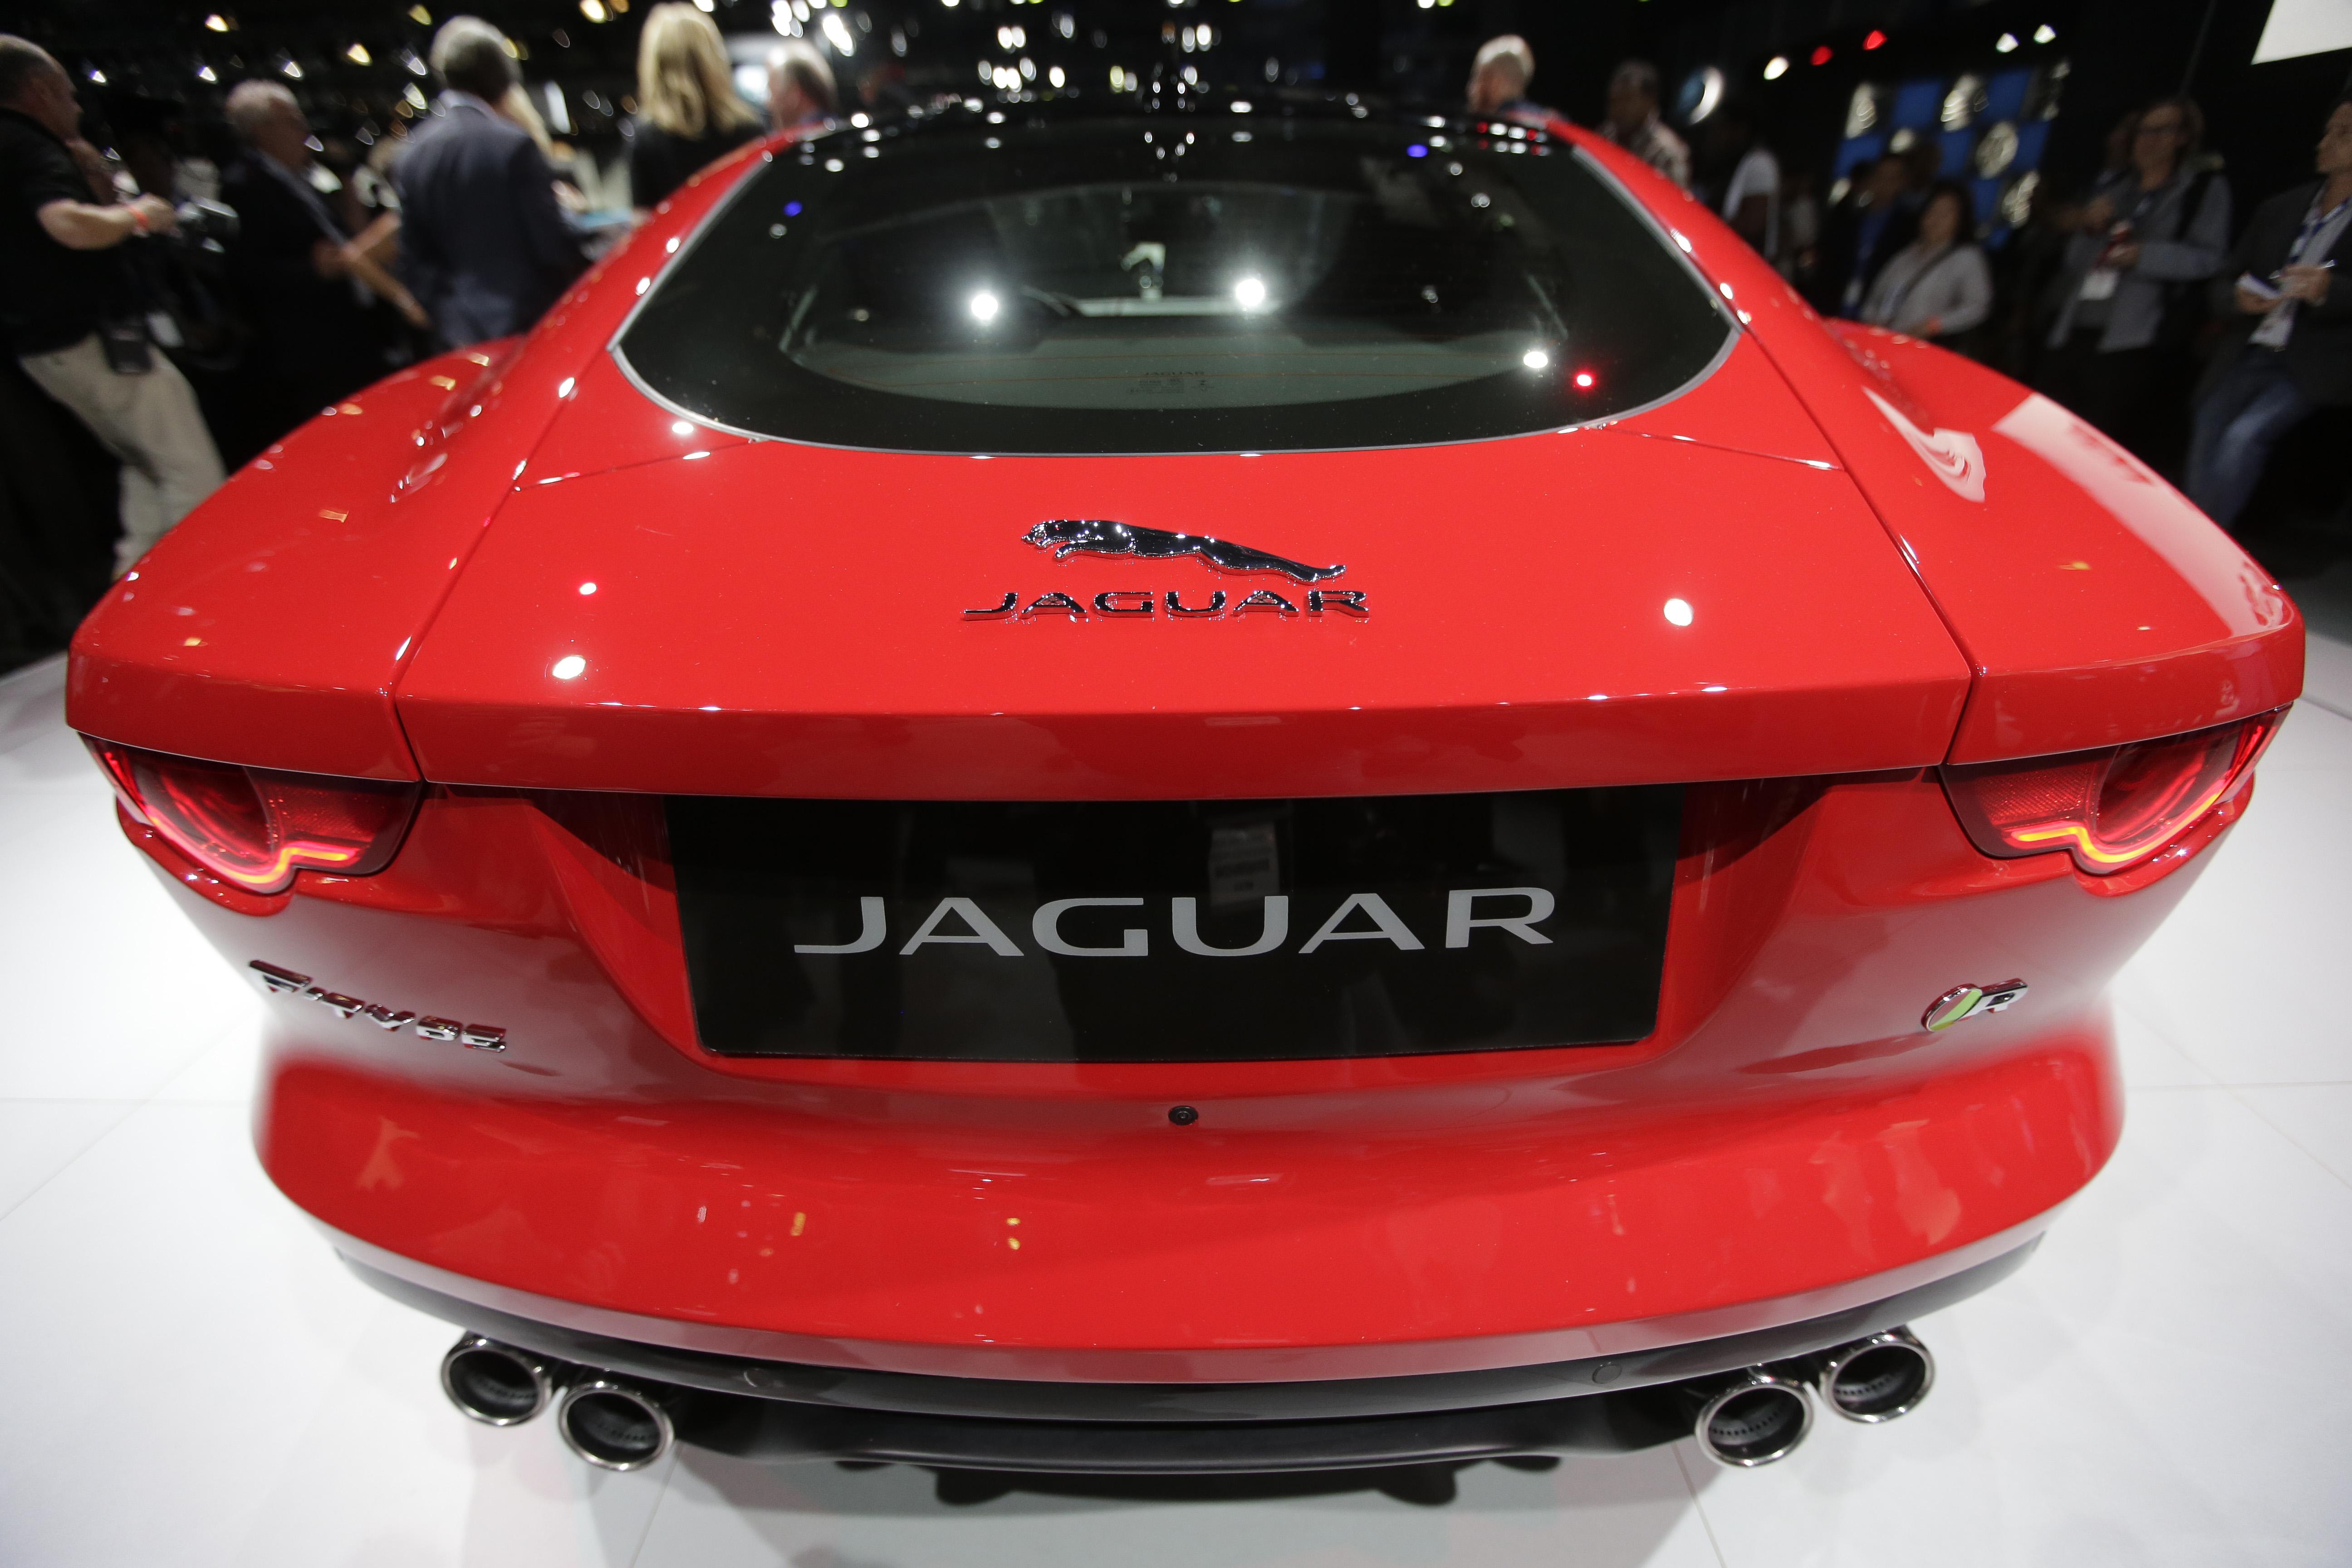 a of forum image forums dealership xj xjr new angeles los jaguar owner portfolio